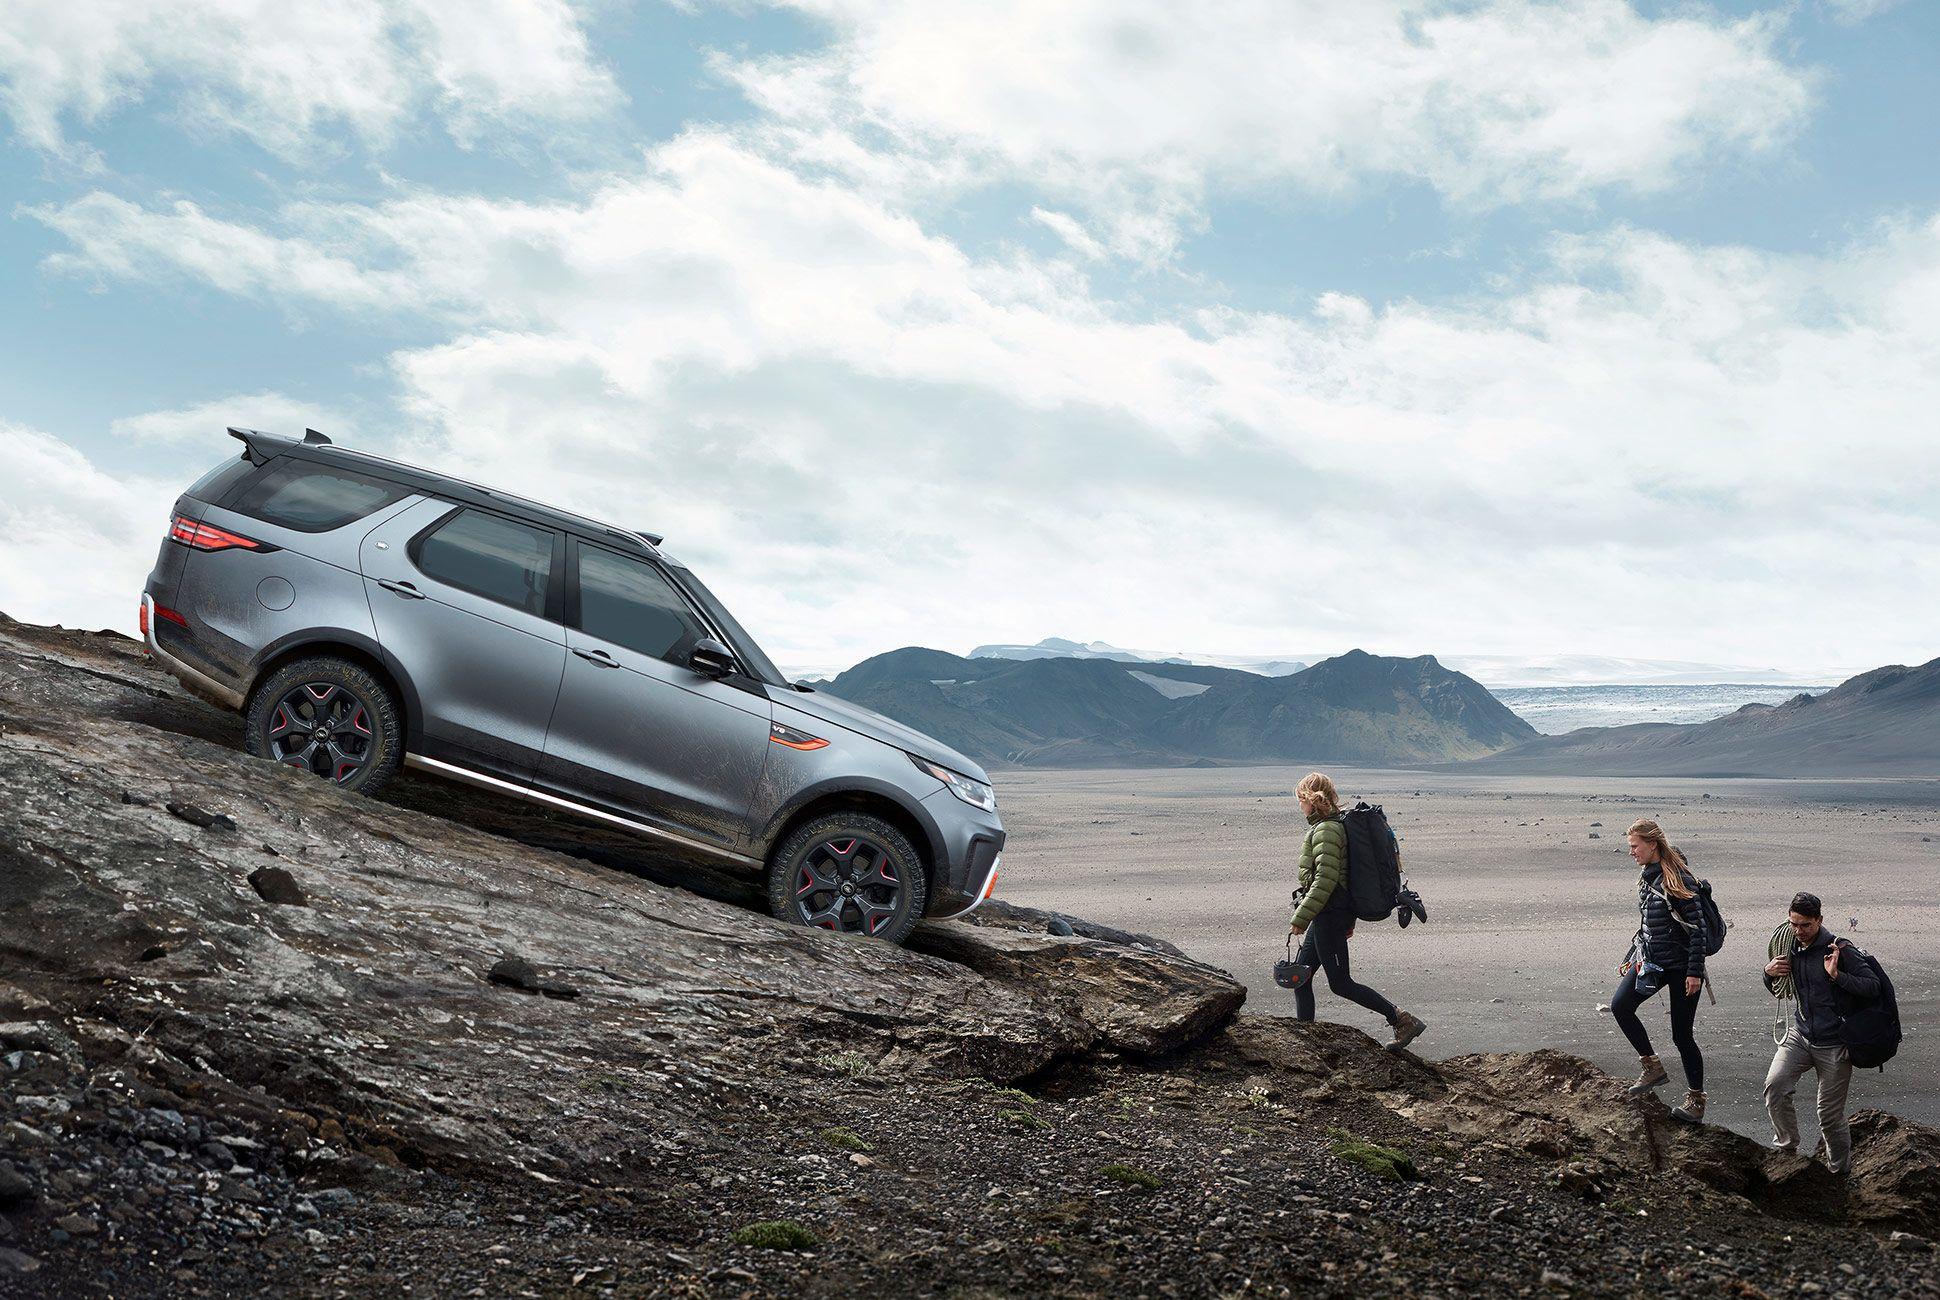 Land-Rover-Discovery-SVX-gear-patrol-2